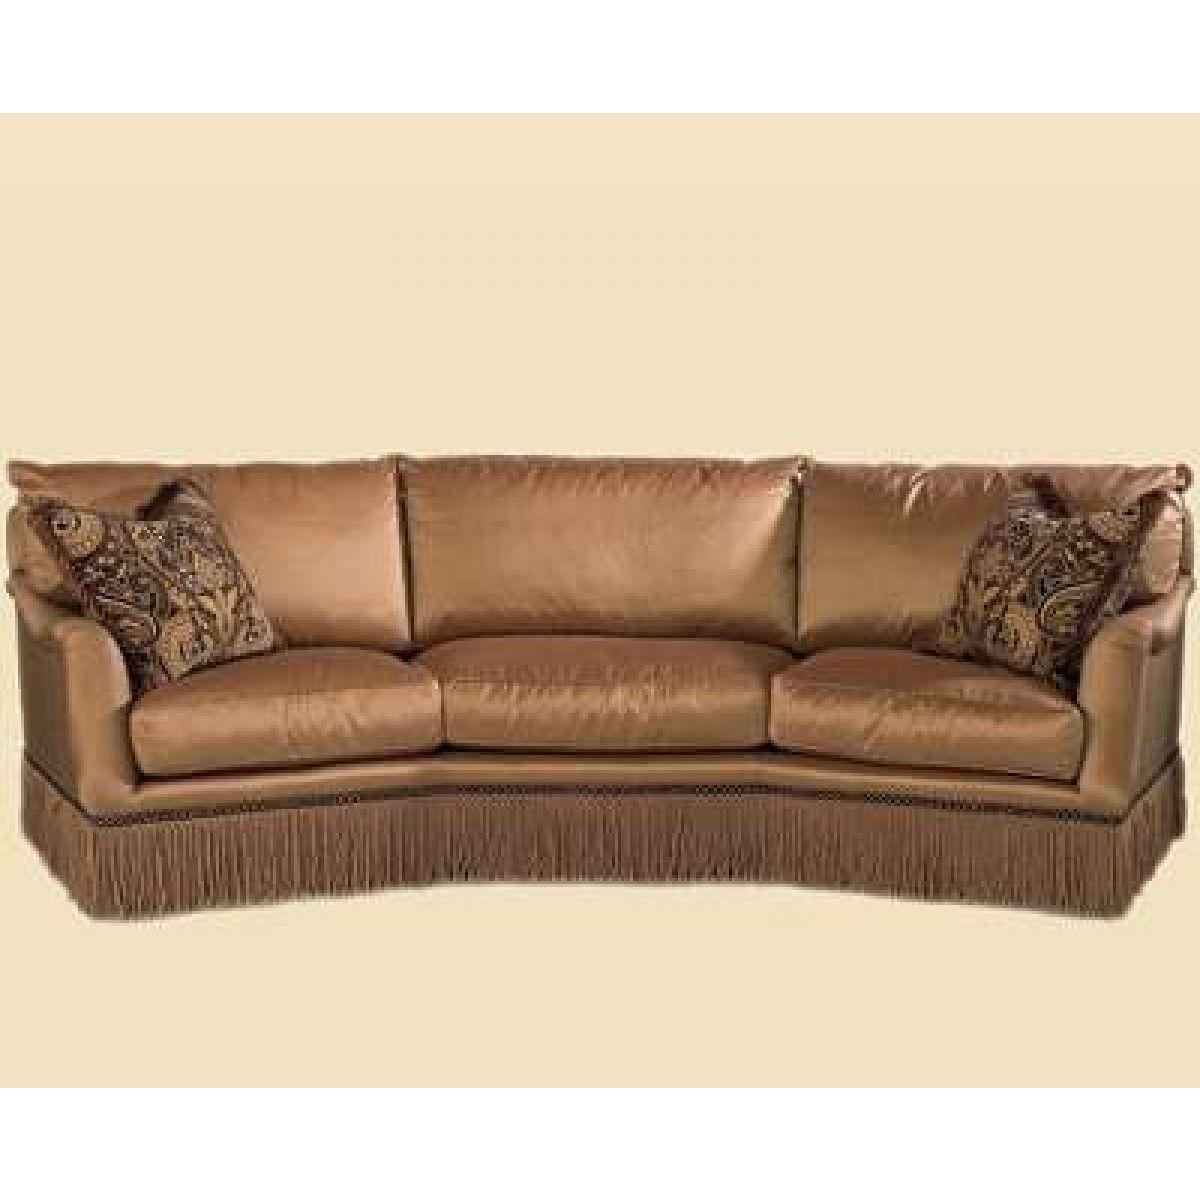 Marge Carson Santa Barbara Wedge Sofa (With Images